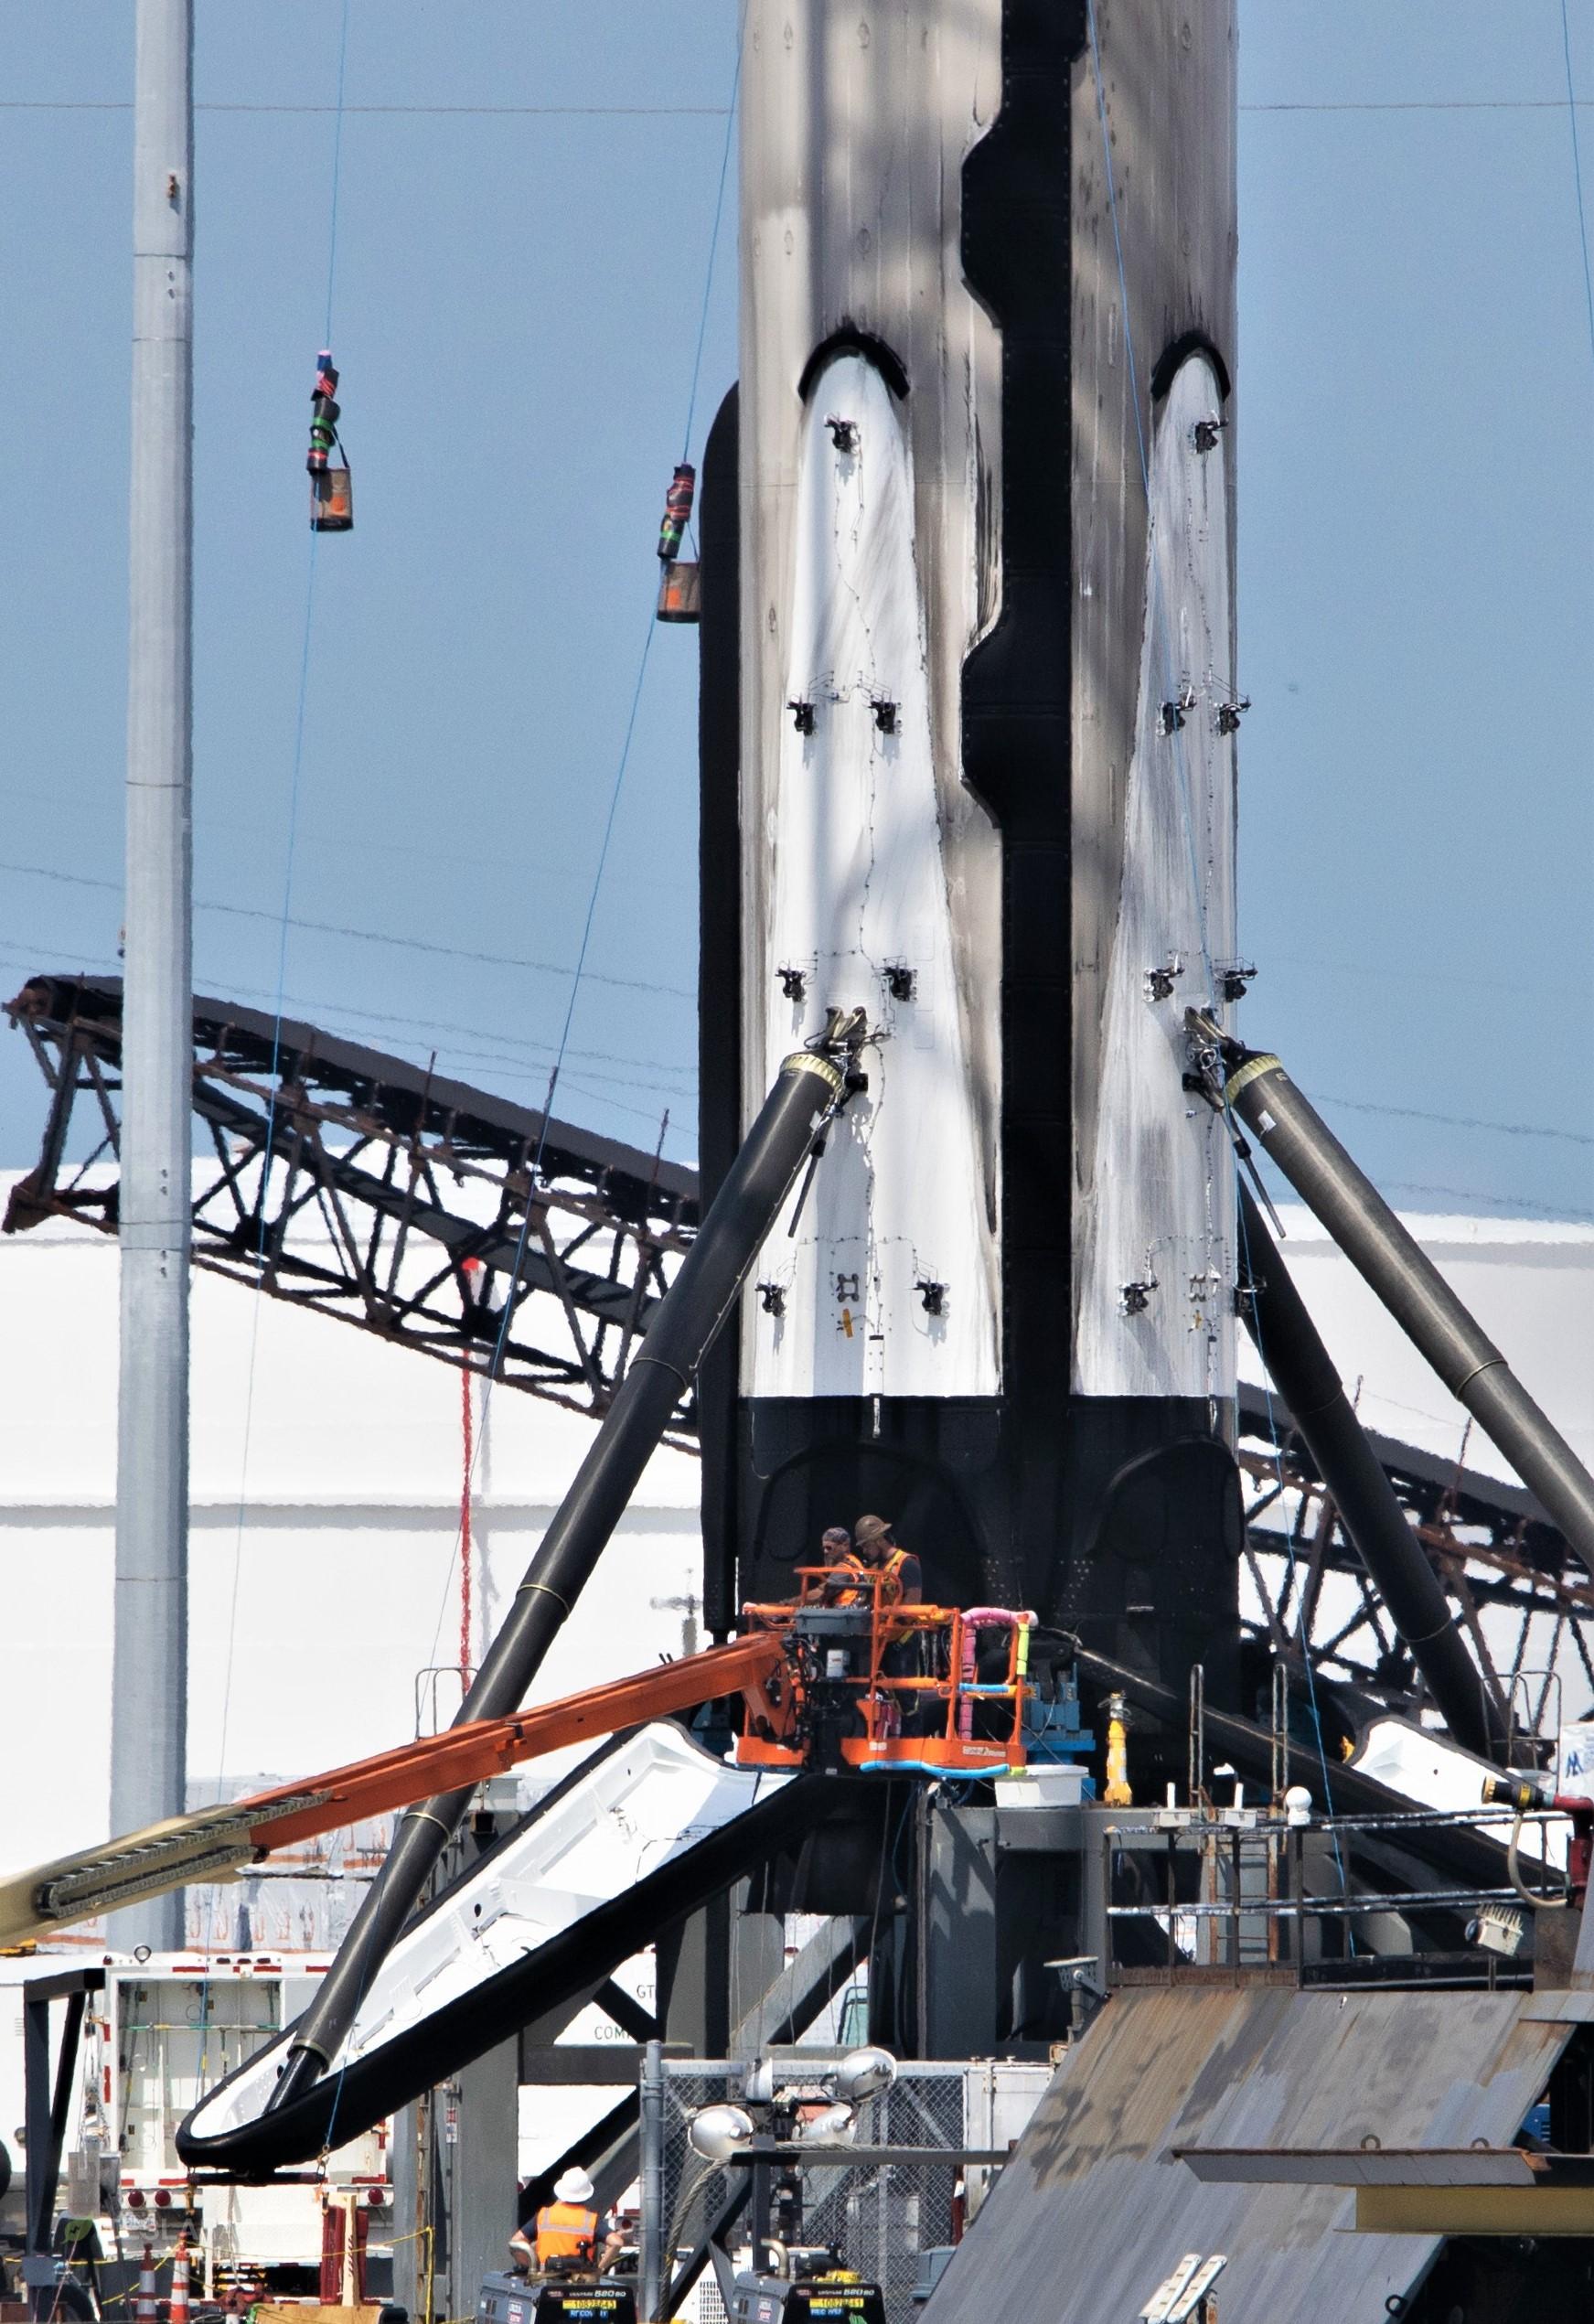 Falcon 9 b1056 leg retraction 1 of 4 050719 (Tom Cross) 1